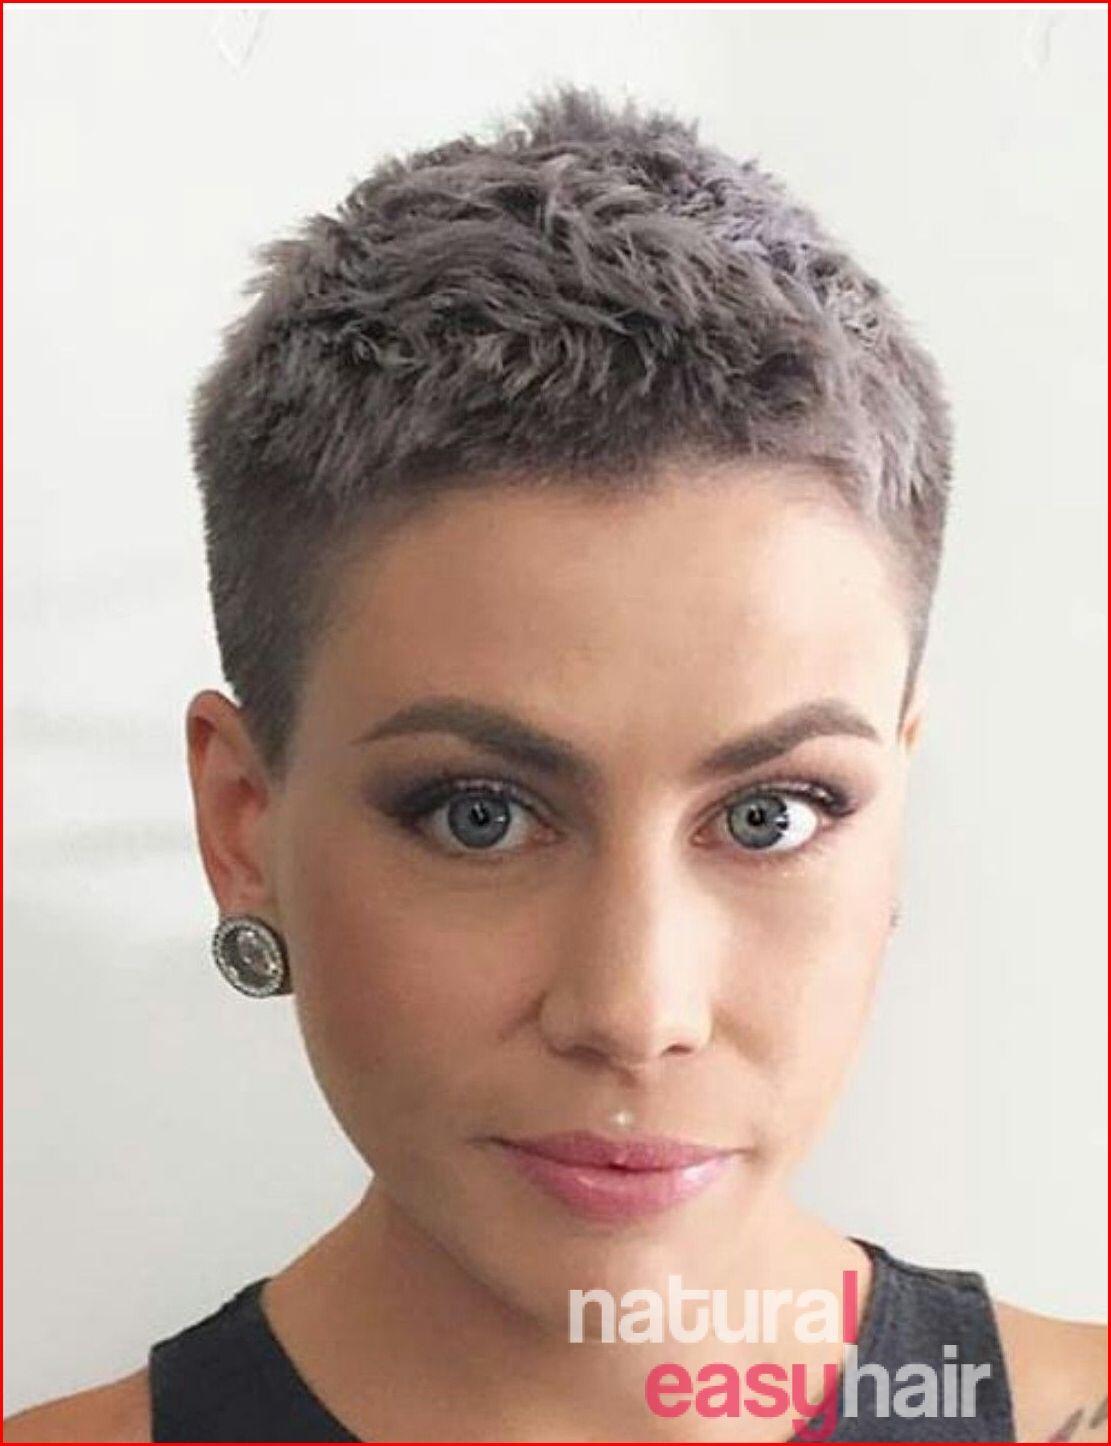 Options To Select The Right Very Short Hairstyles Easy Natural Hairstyles Kapsels Voor Kort Haar Heel Kort Haar Kort Haar